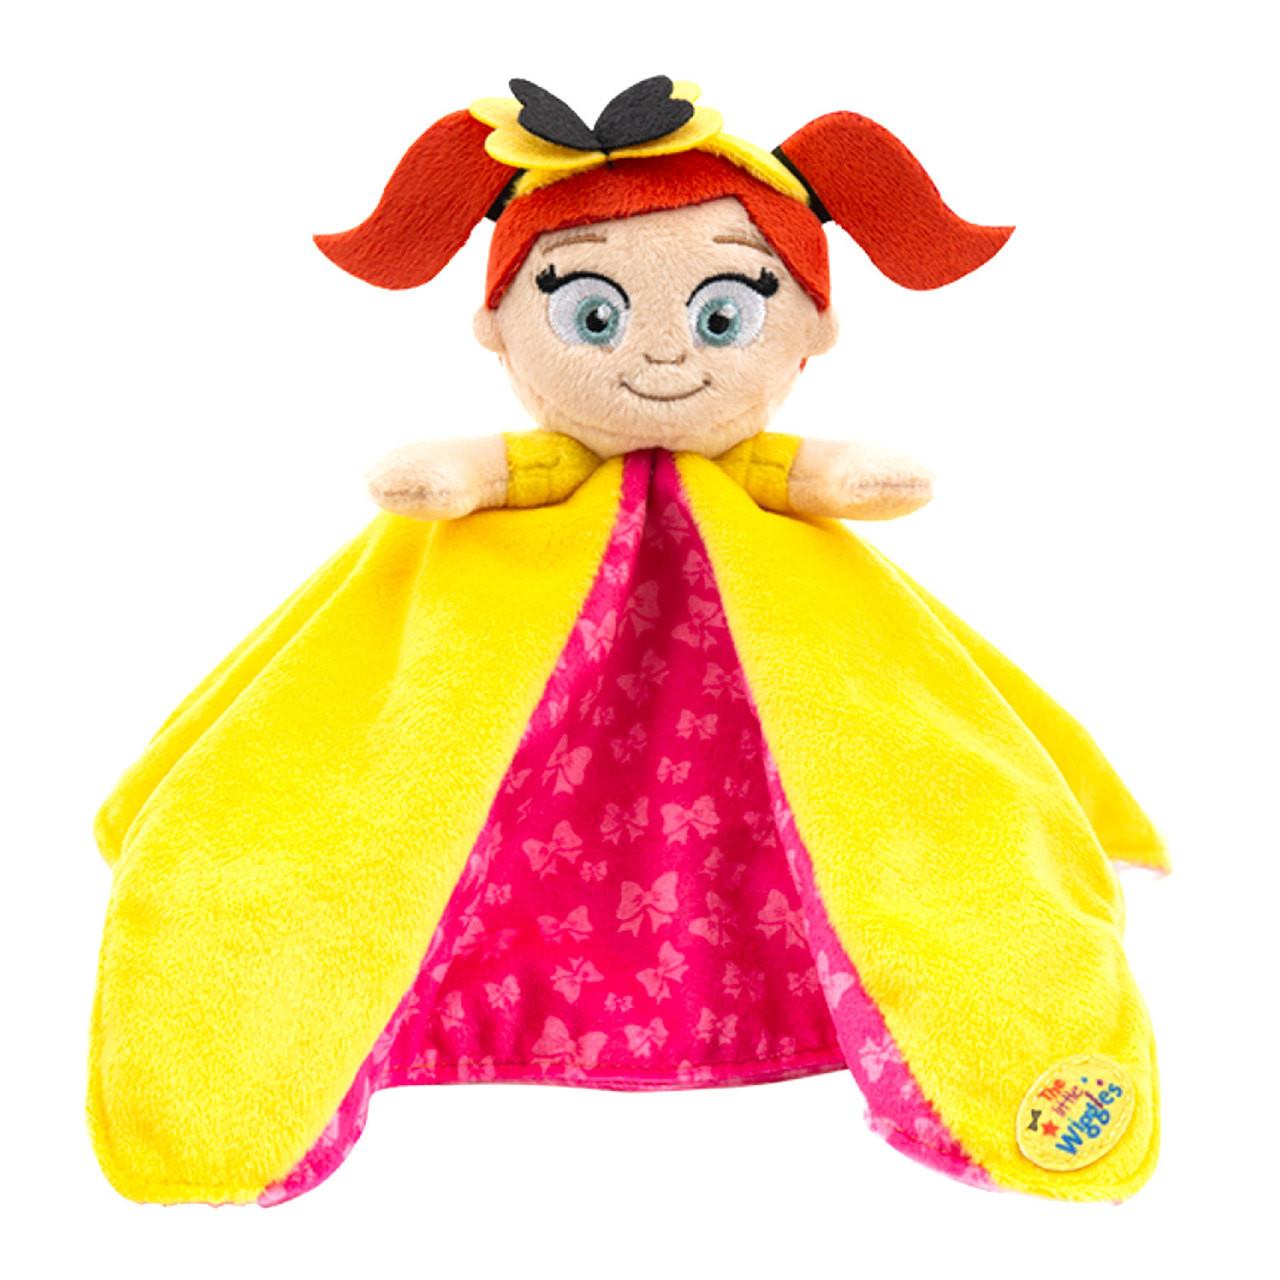 Little Wiggles Comfort Blanket : Emma